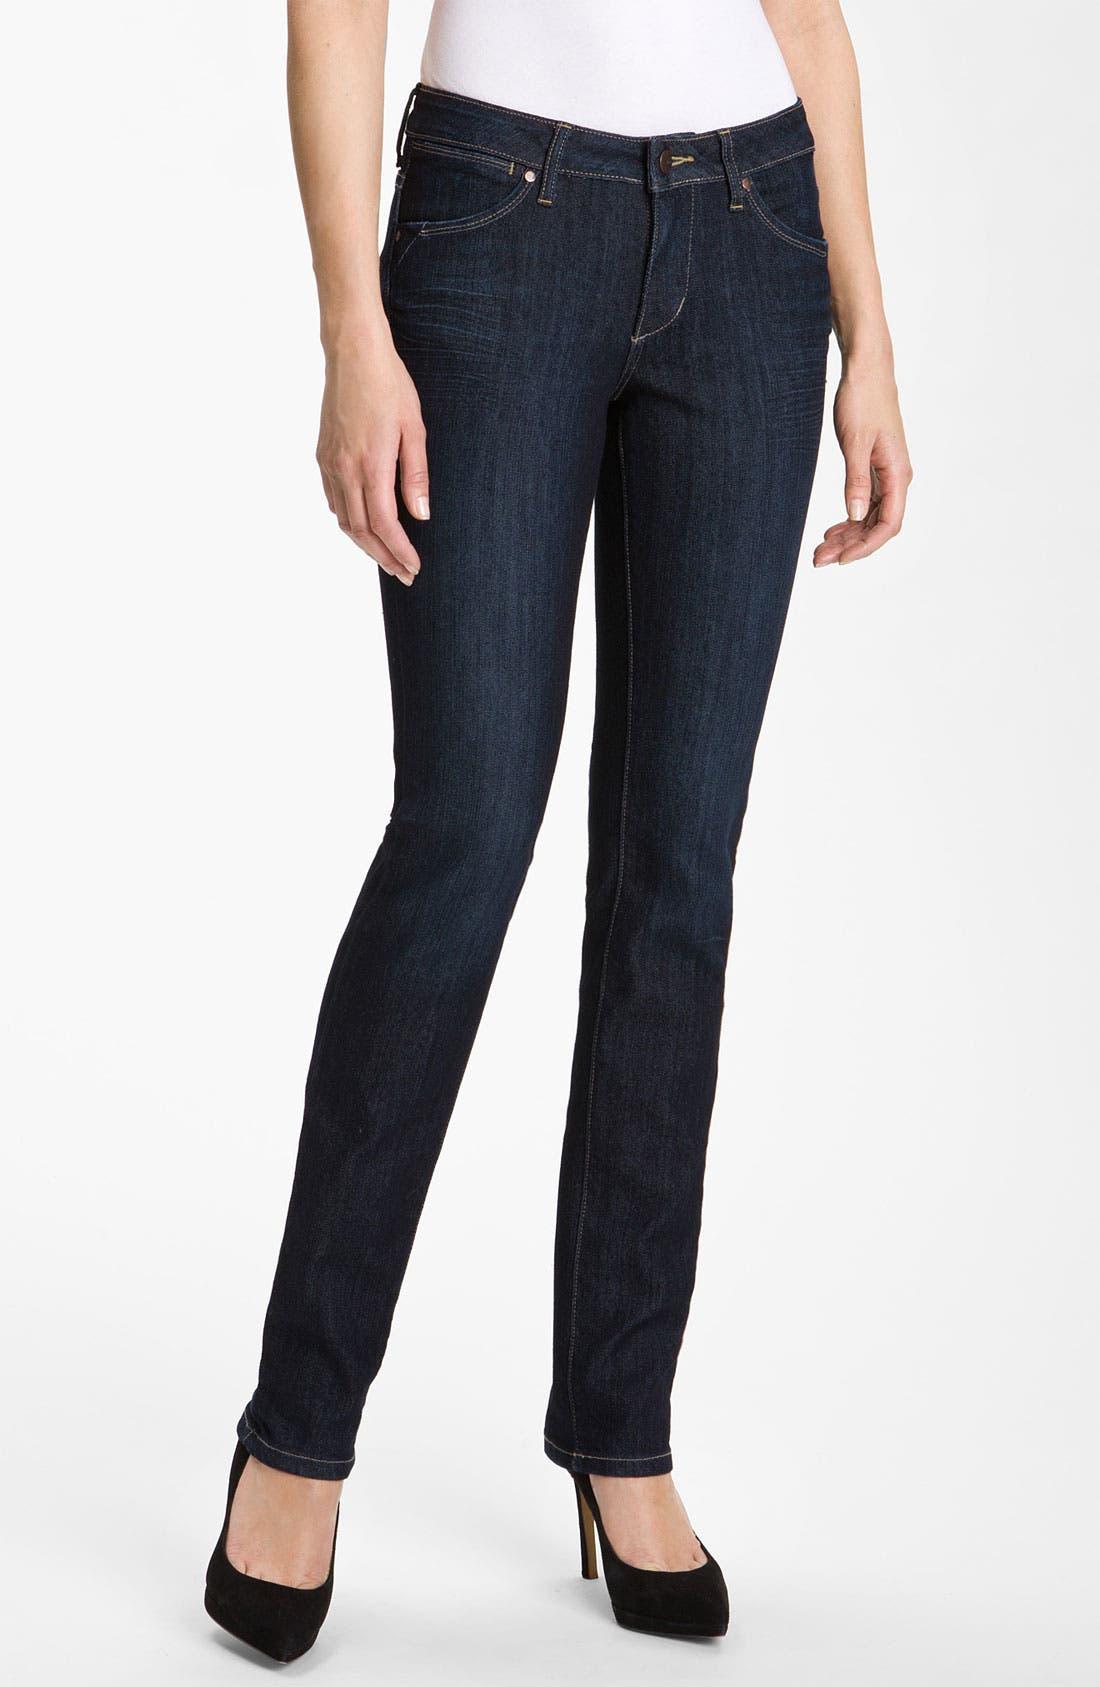 Alternate Image 1 Selected - Jag Jeans 'New Jane' Slim Leg Jeans (Petite)